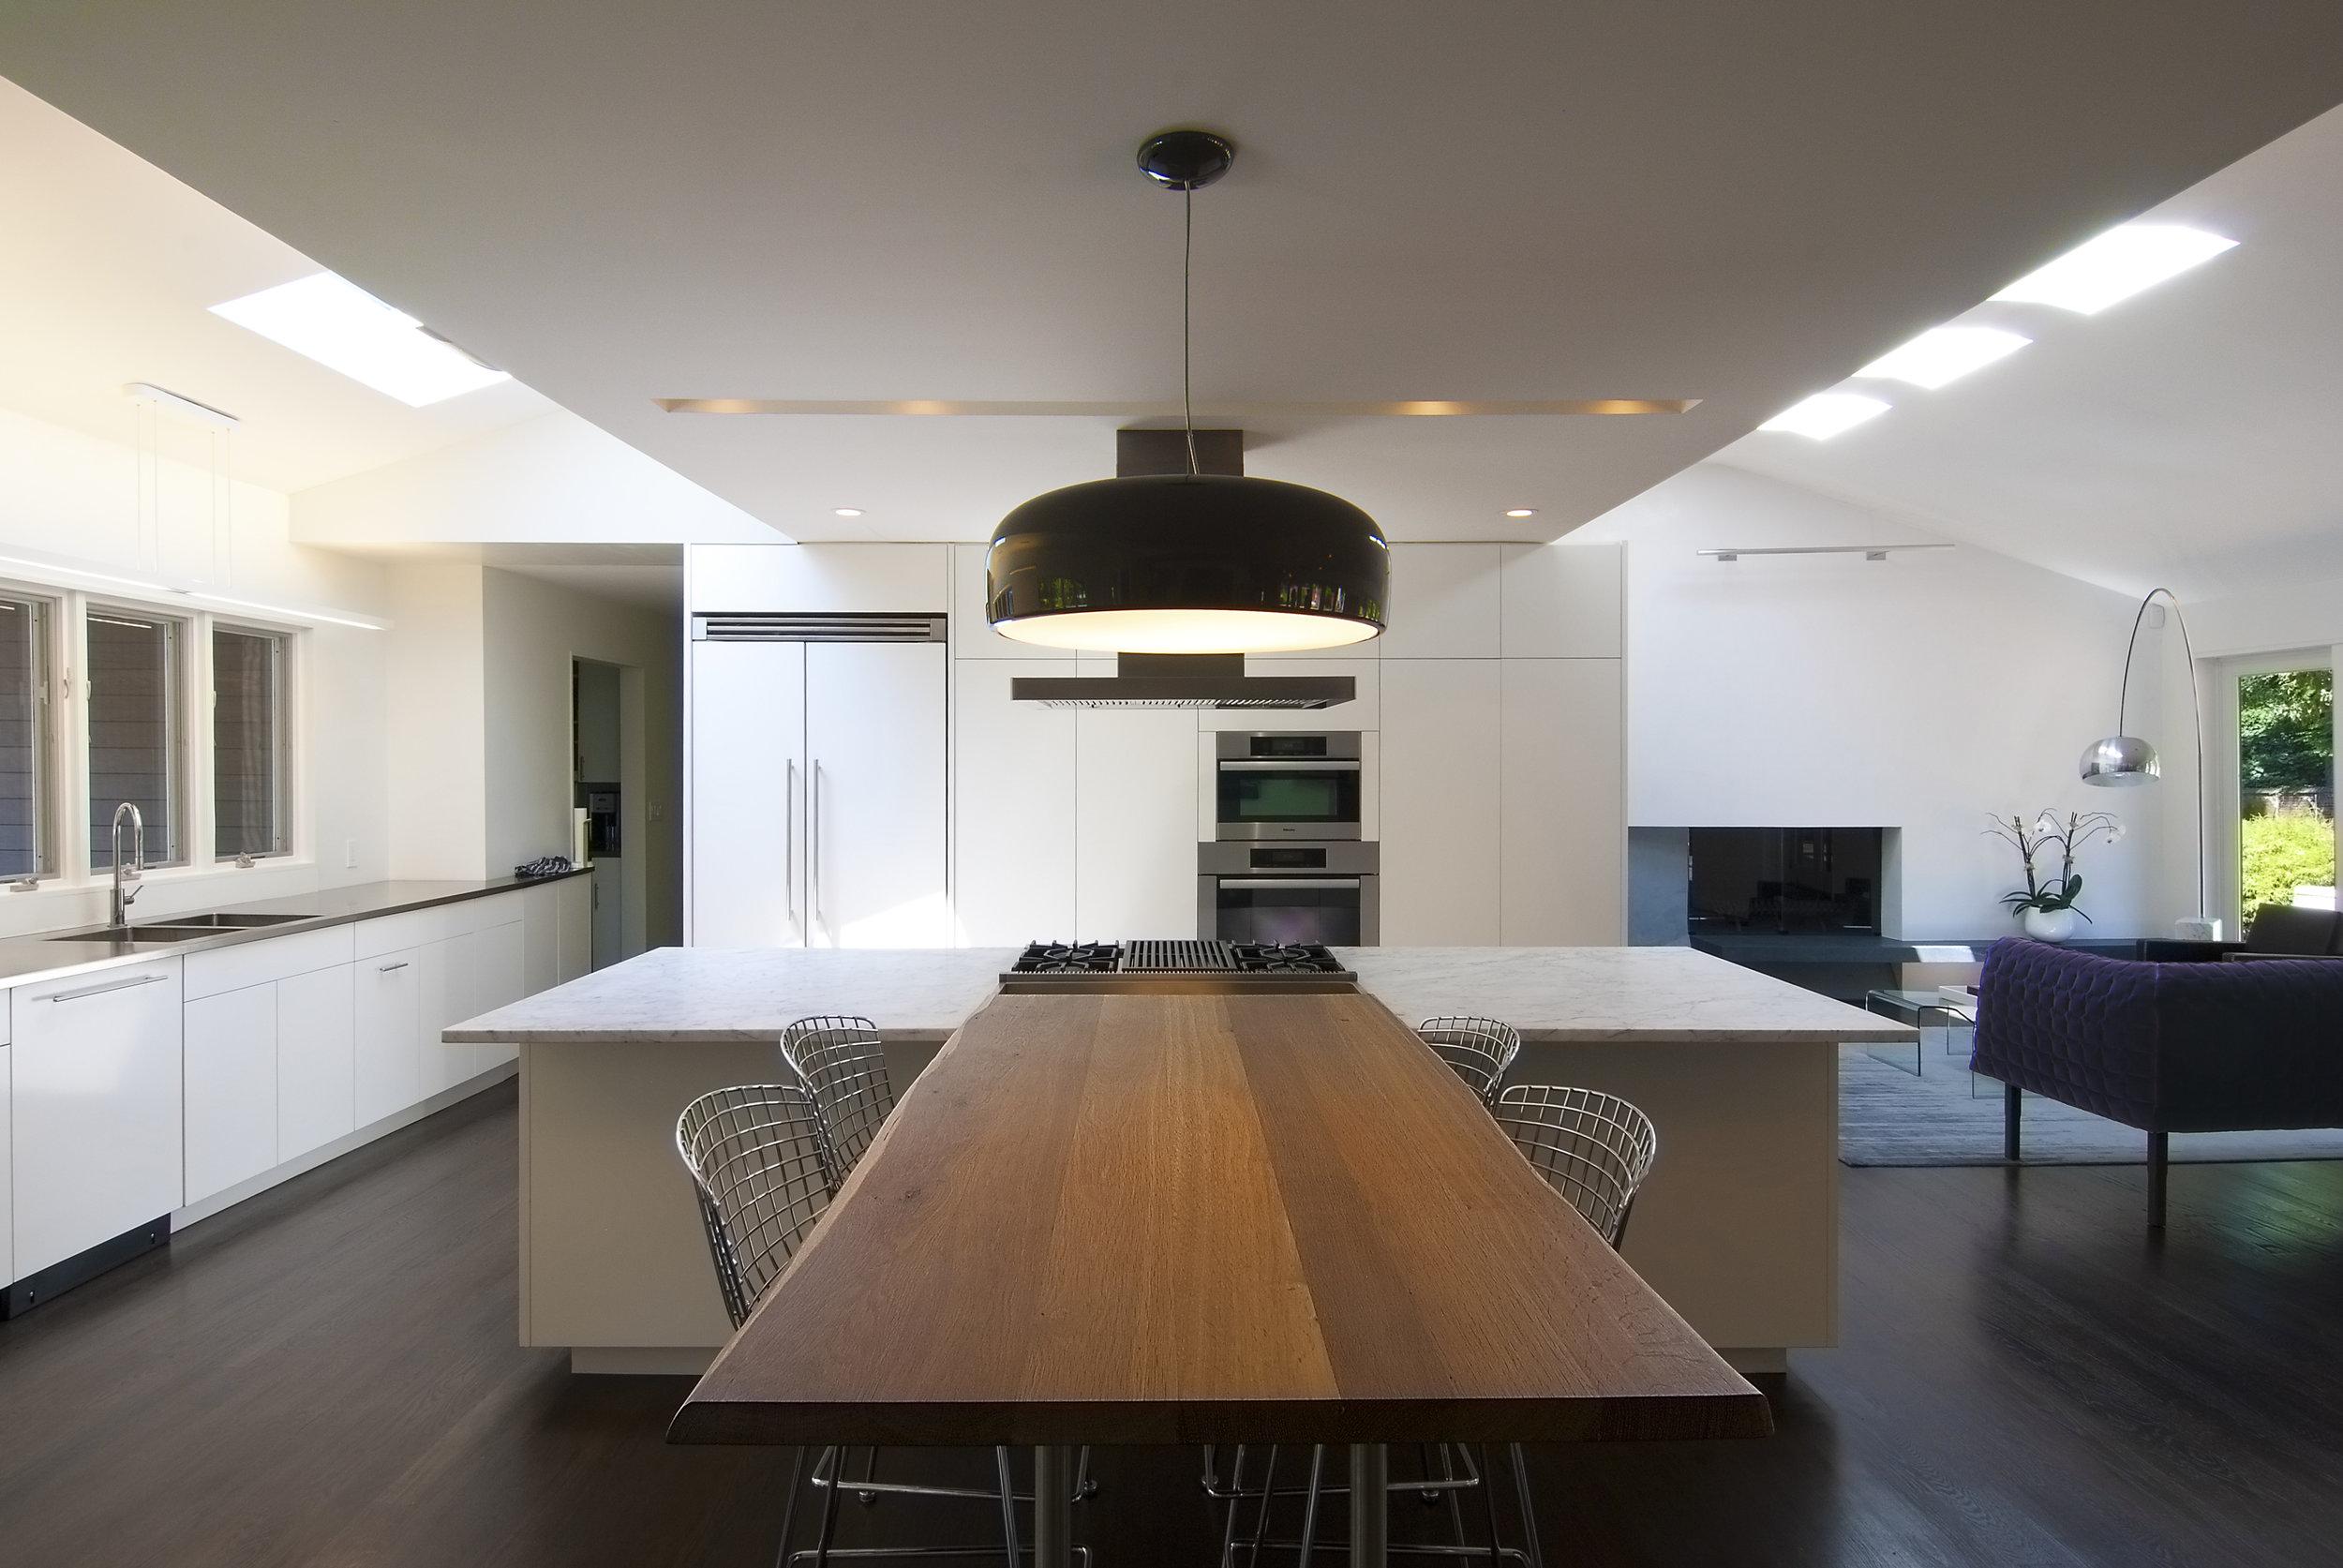 04_Kitchen_Table.jpg